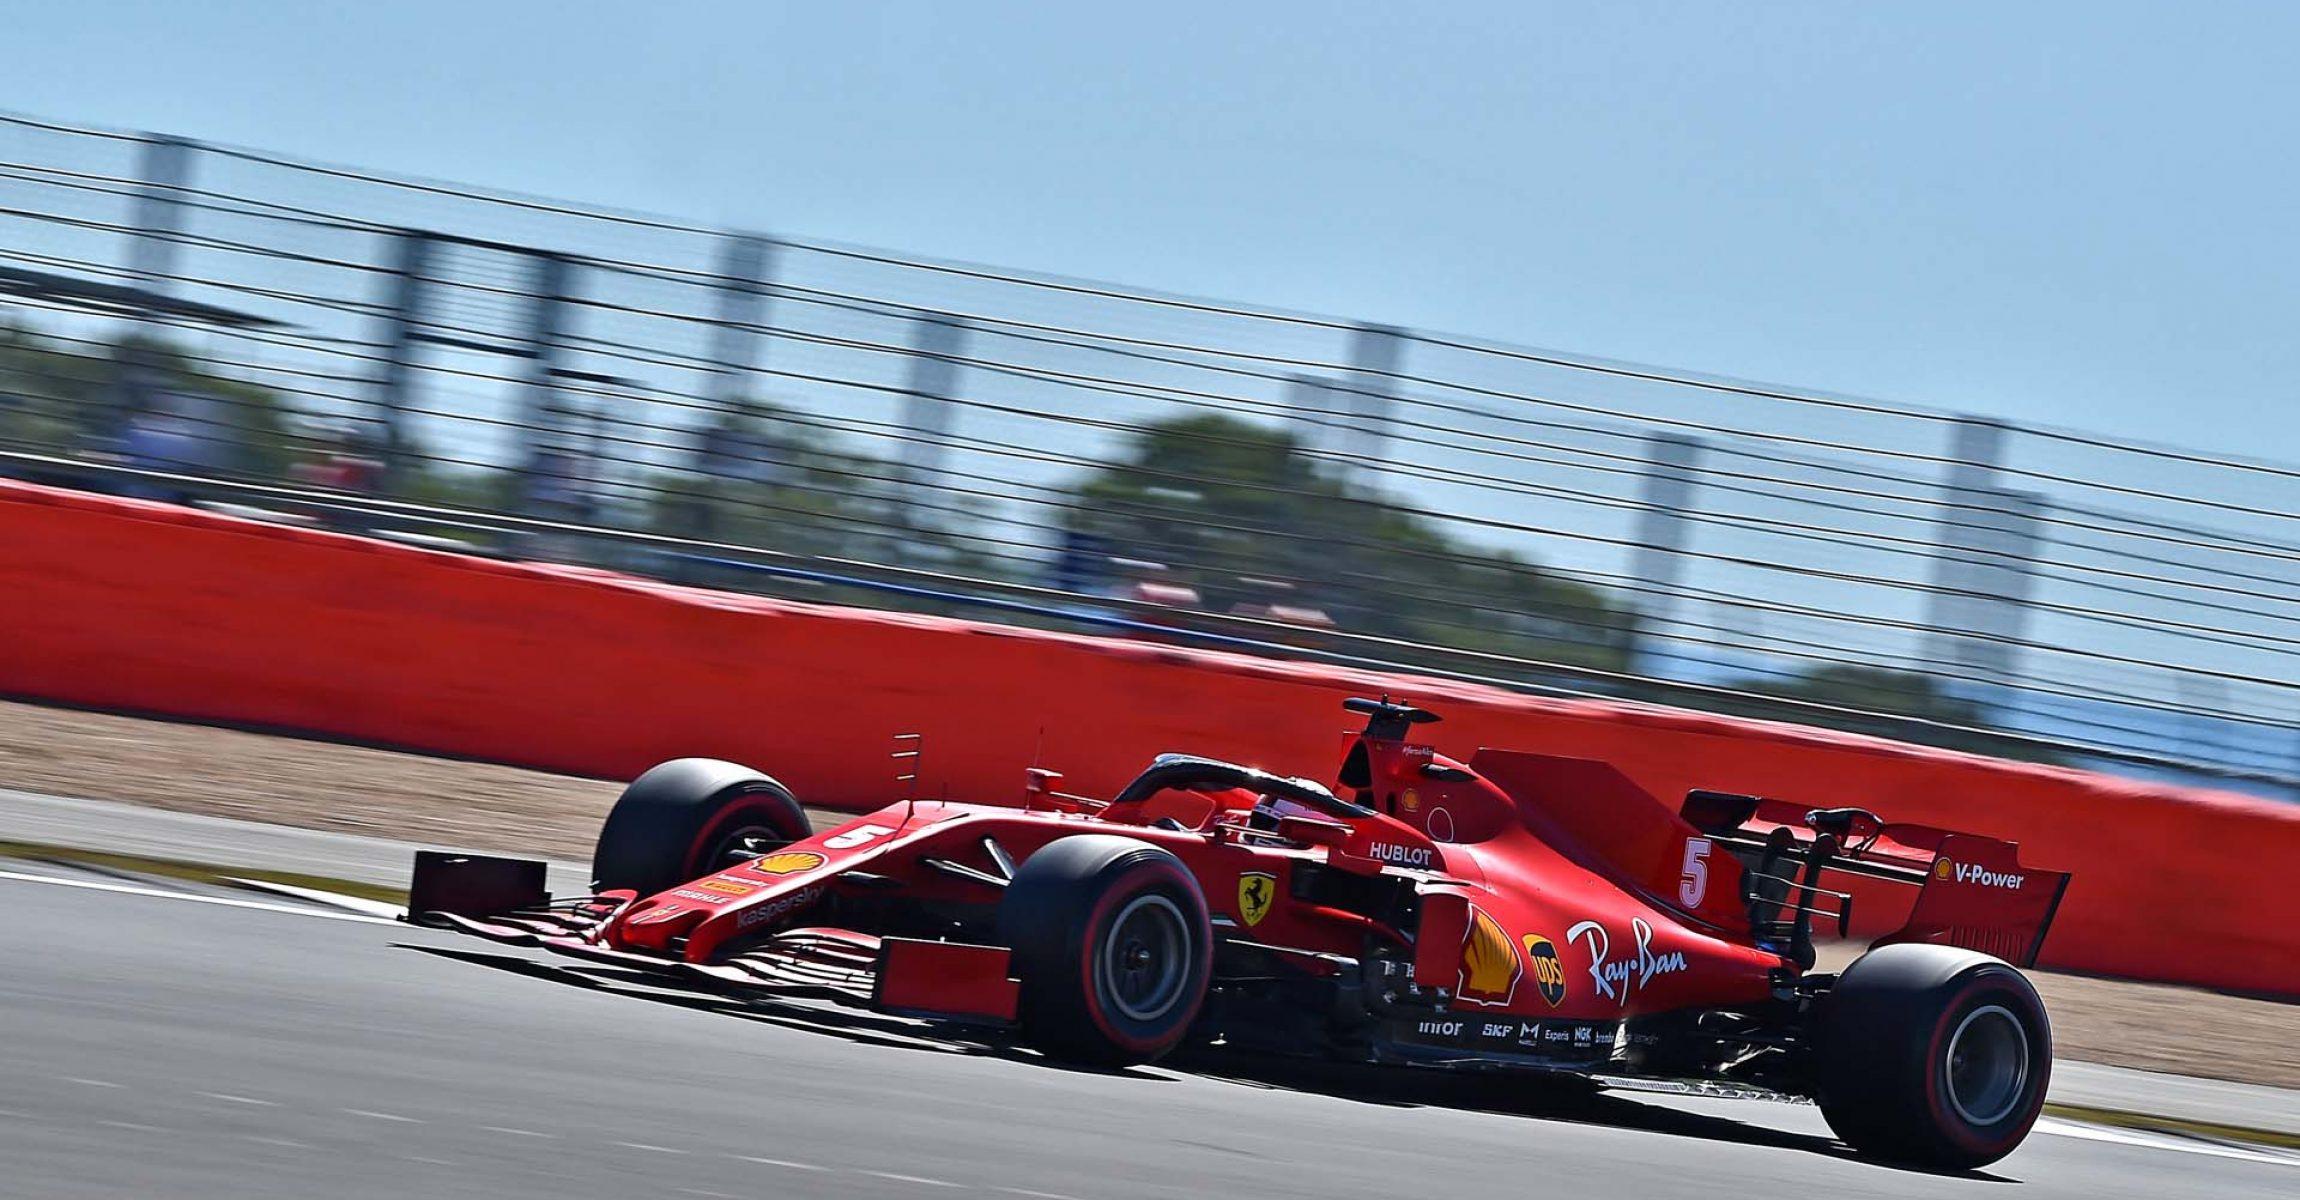 GP 70MO ANNIVERSARIO  F1/2020 -  VENERDÌ 07/08/2020    credit: @Scuderia Ferrari Press Office Sebastian Vettel